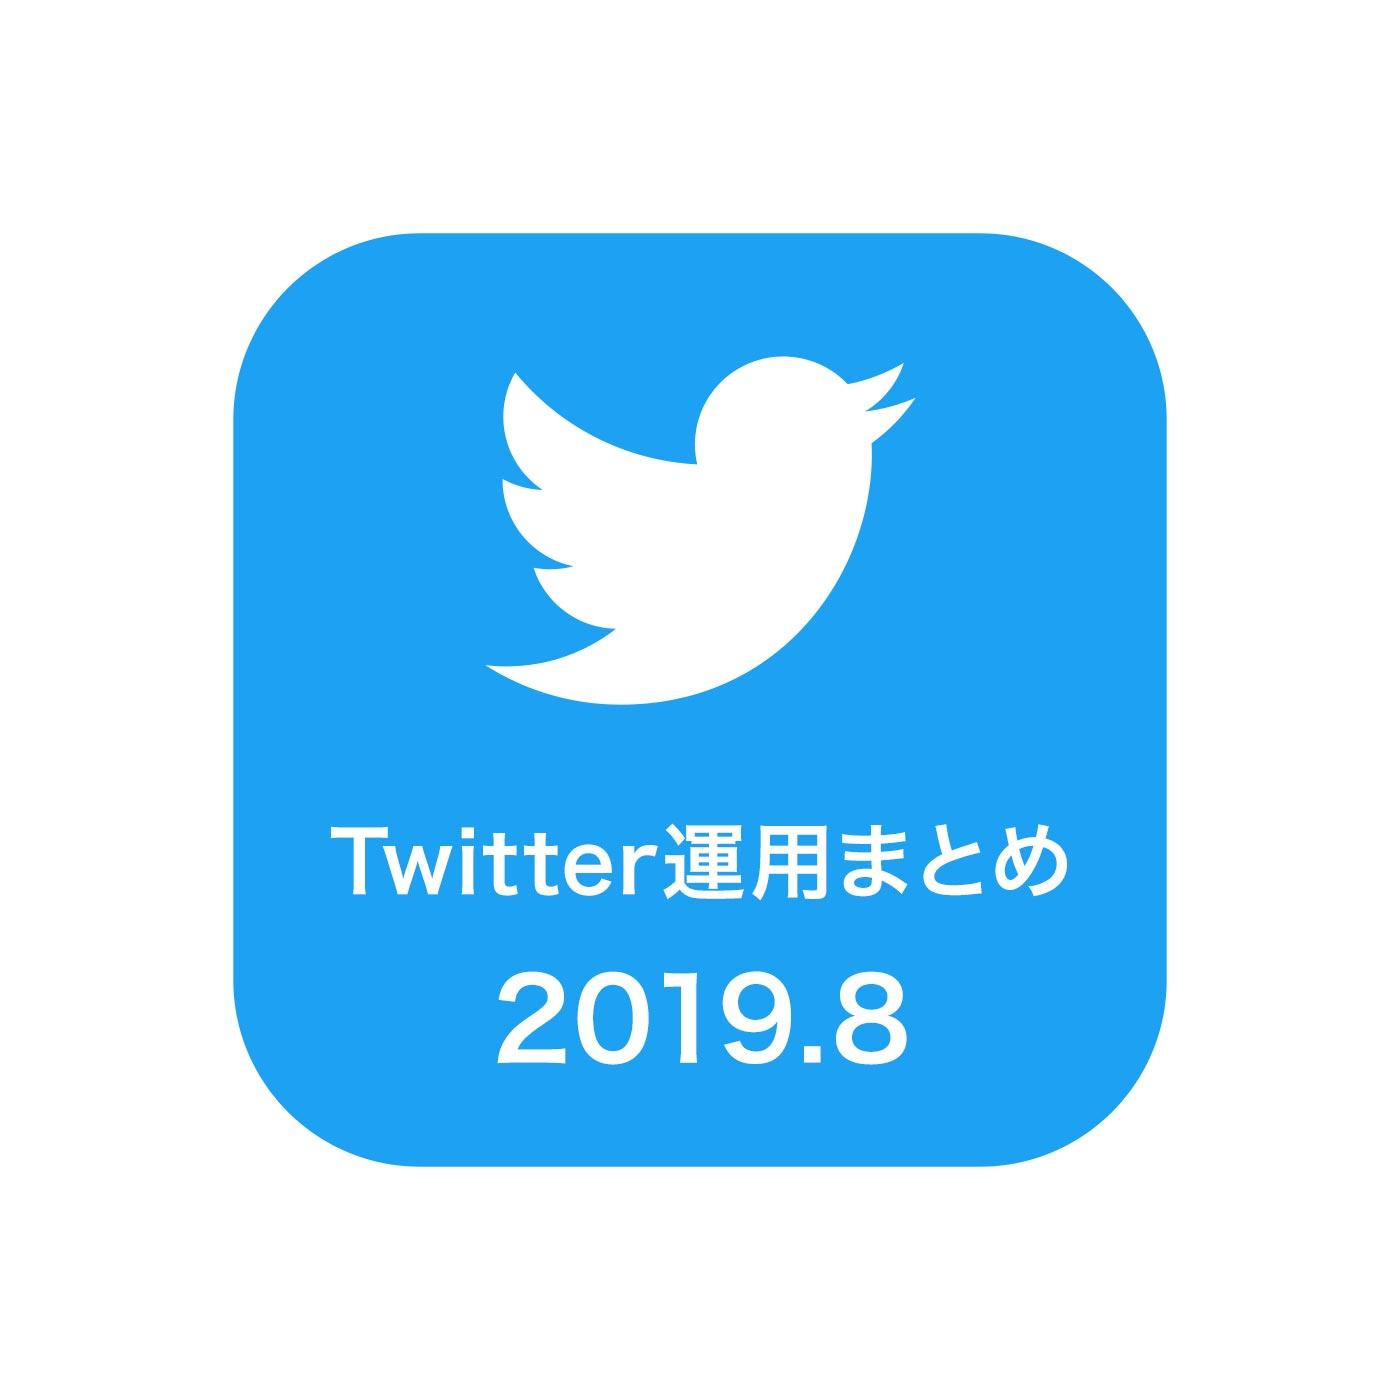 Twitter初心者2ヶ月目 ブログとの運用2019年8月 気づきとまとめ